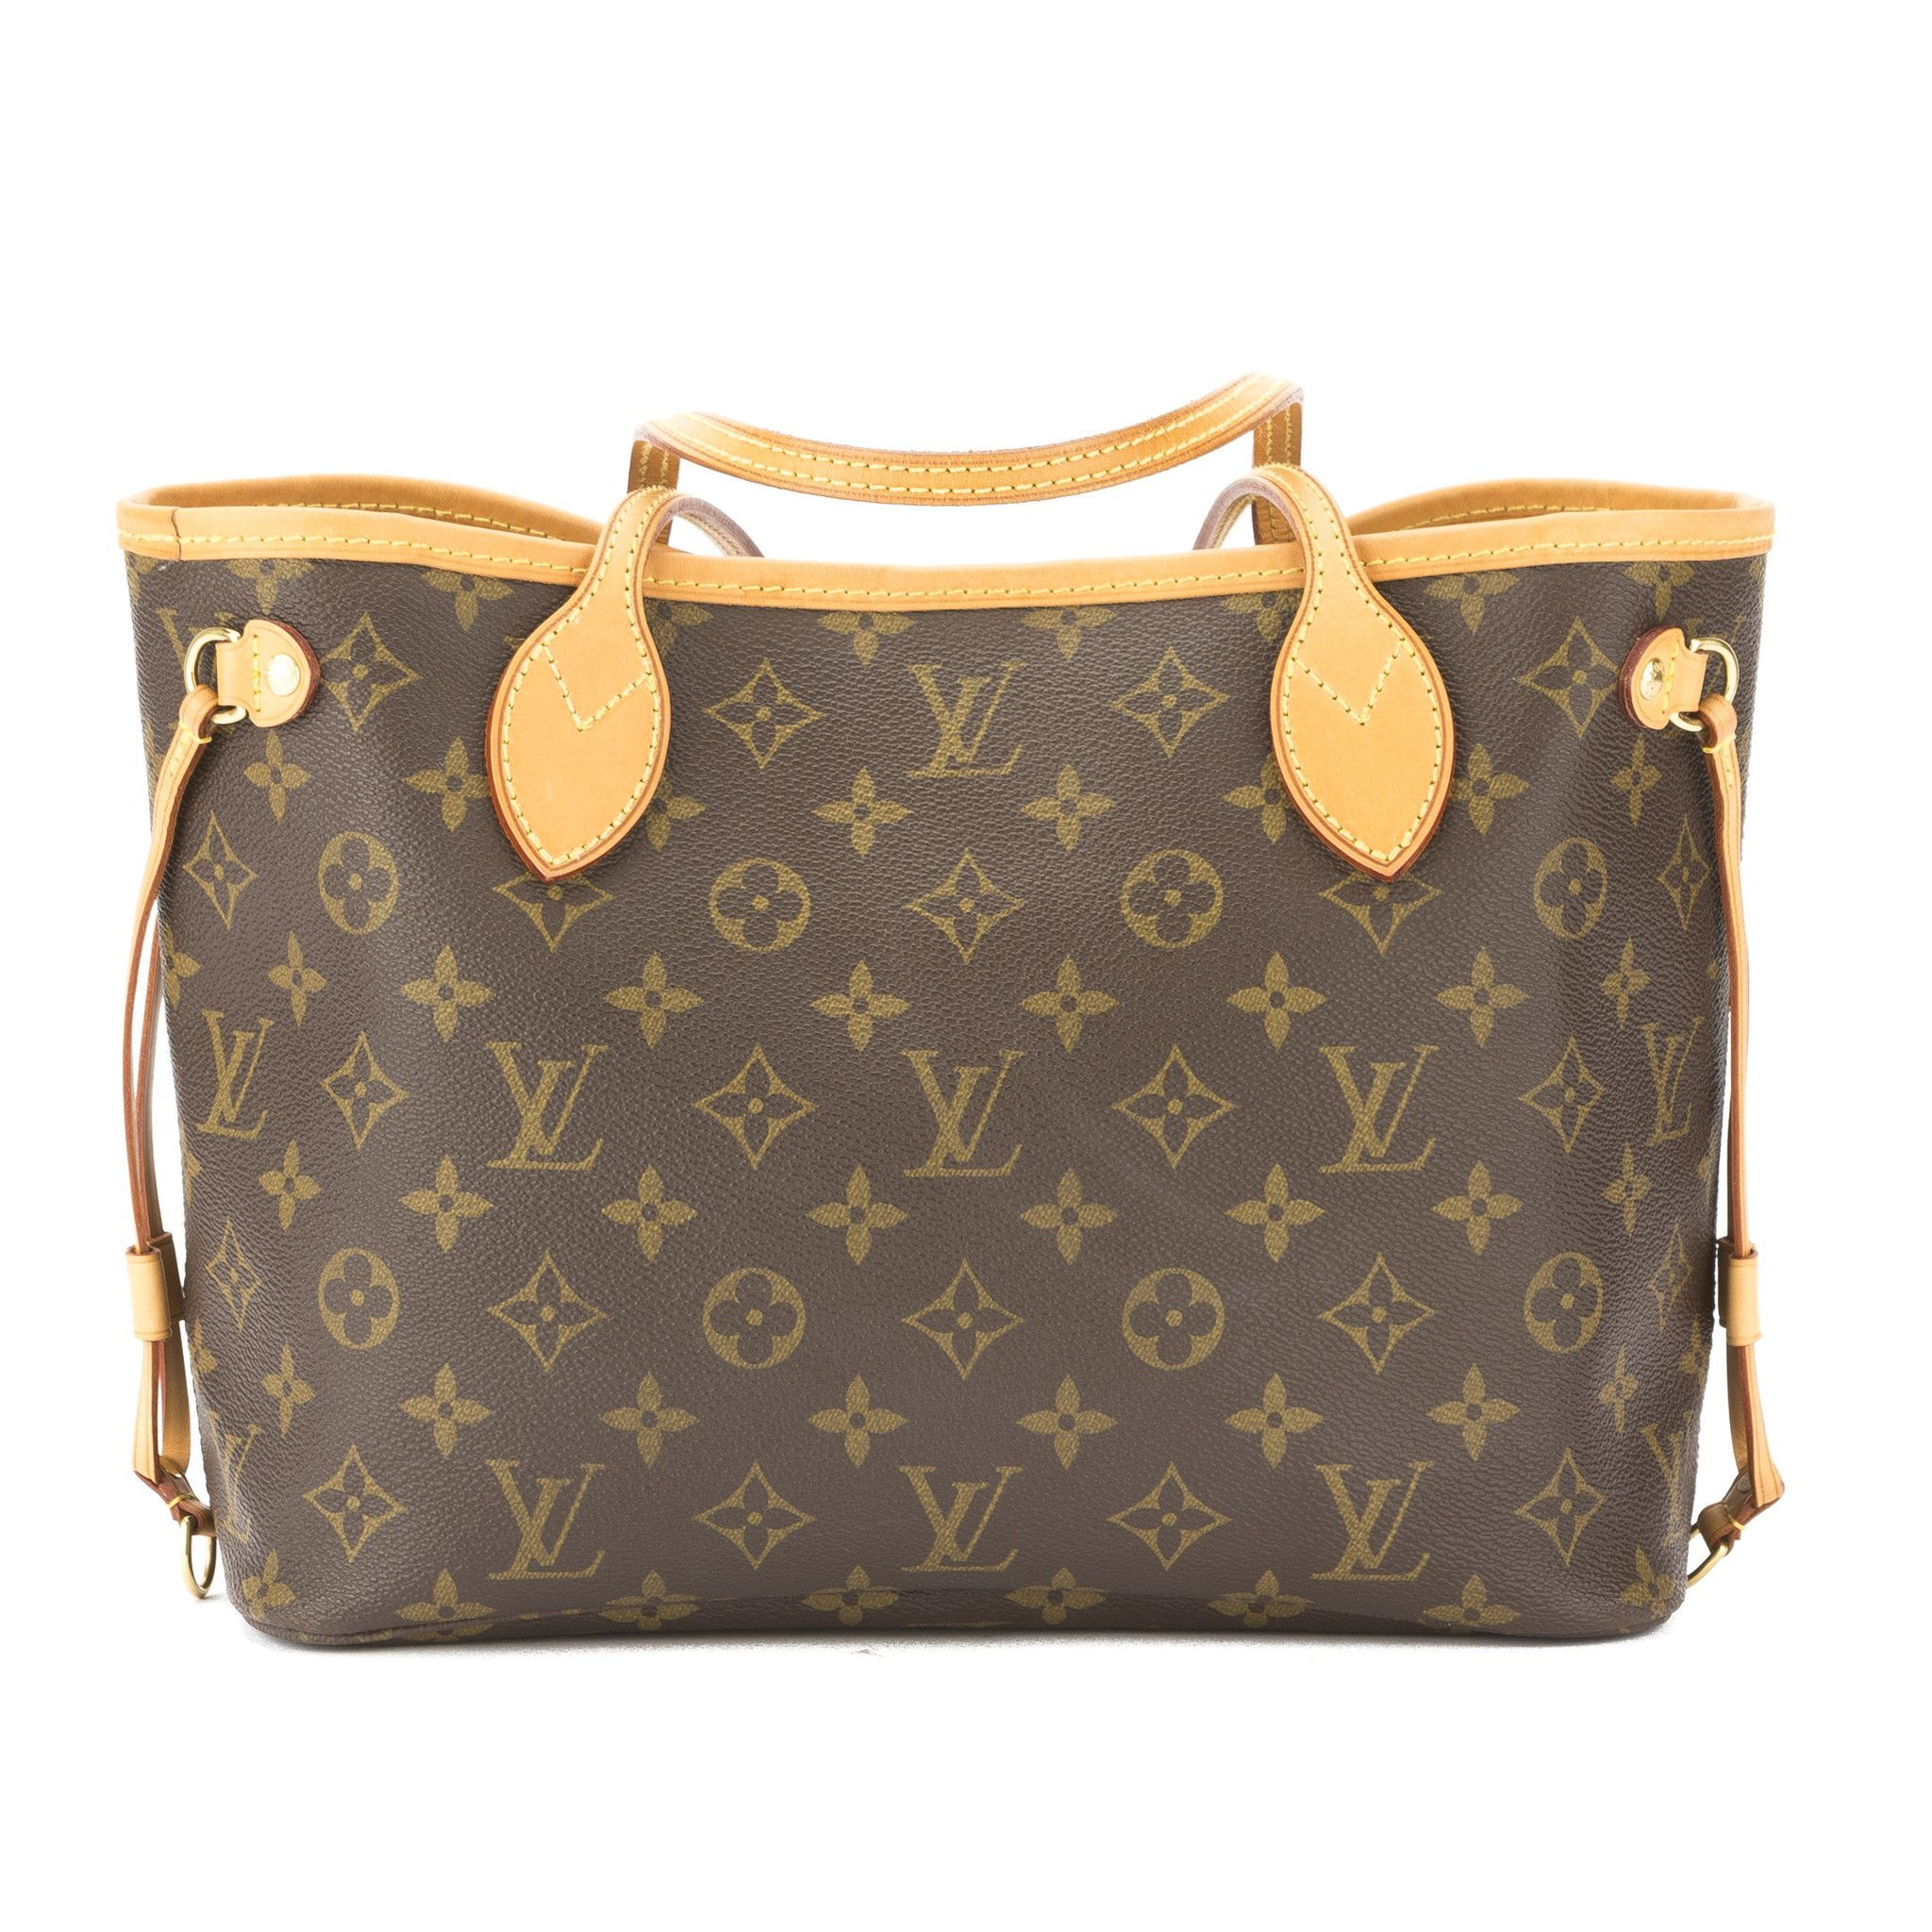 846b5429d7d1 Louis Vuitton Monogram Neverfull PM Bag (Pre Owned)